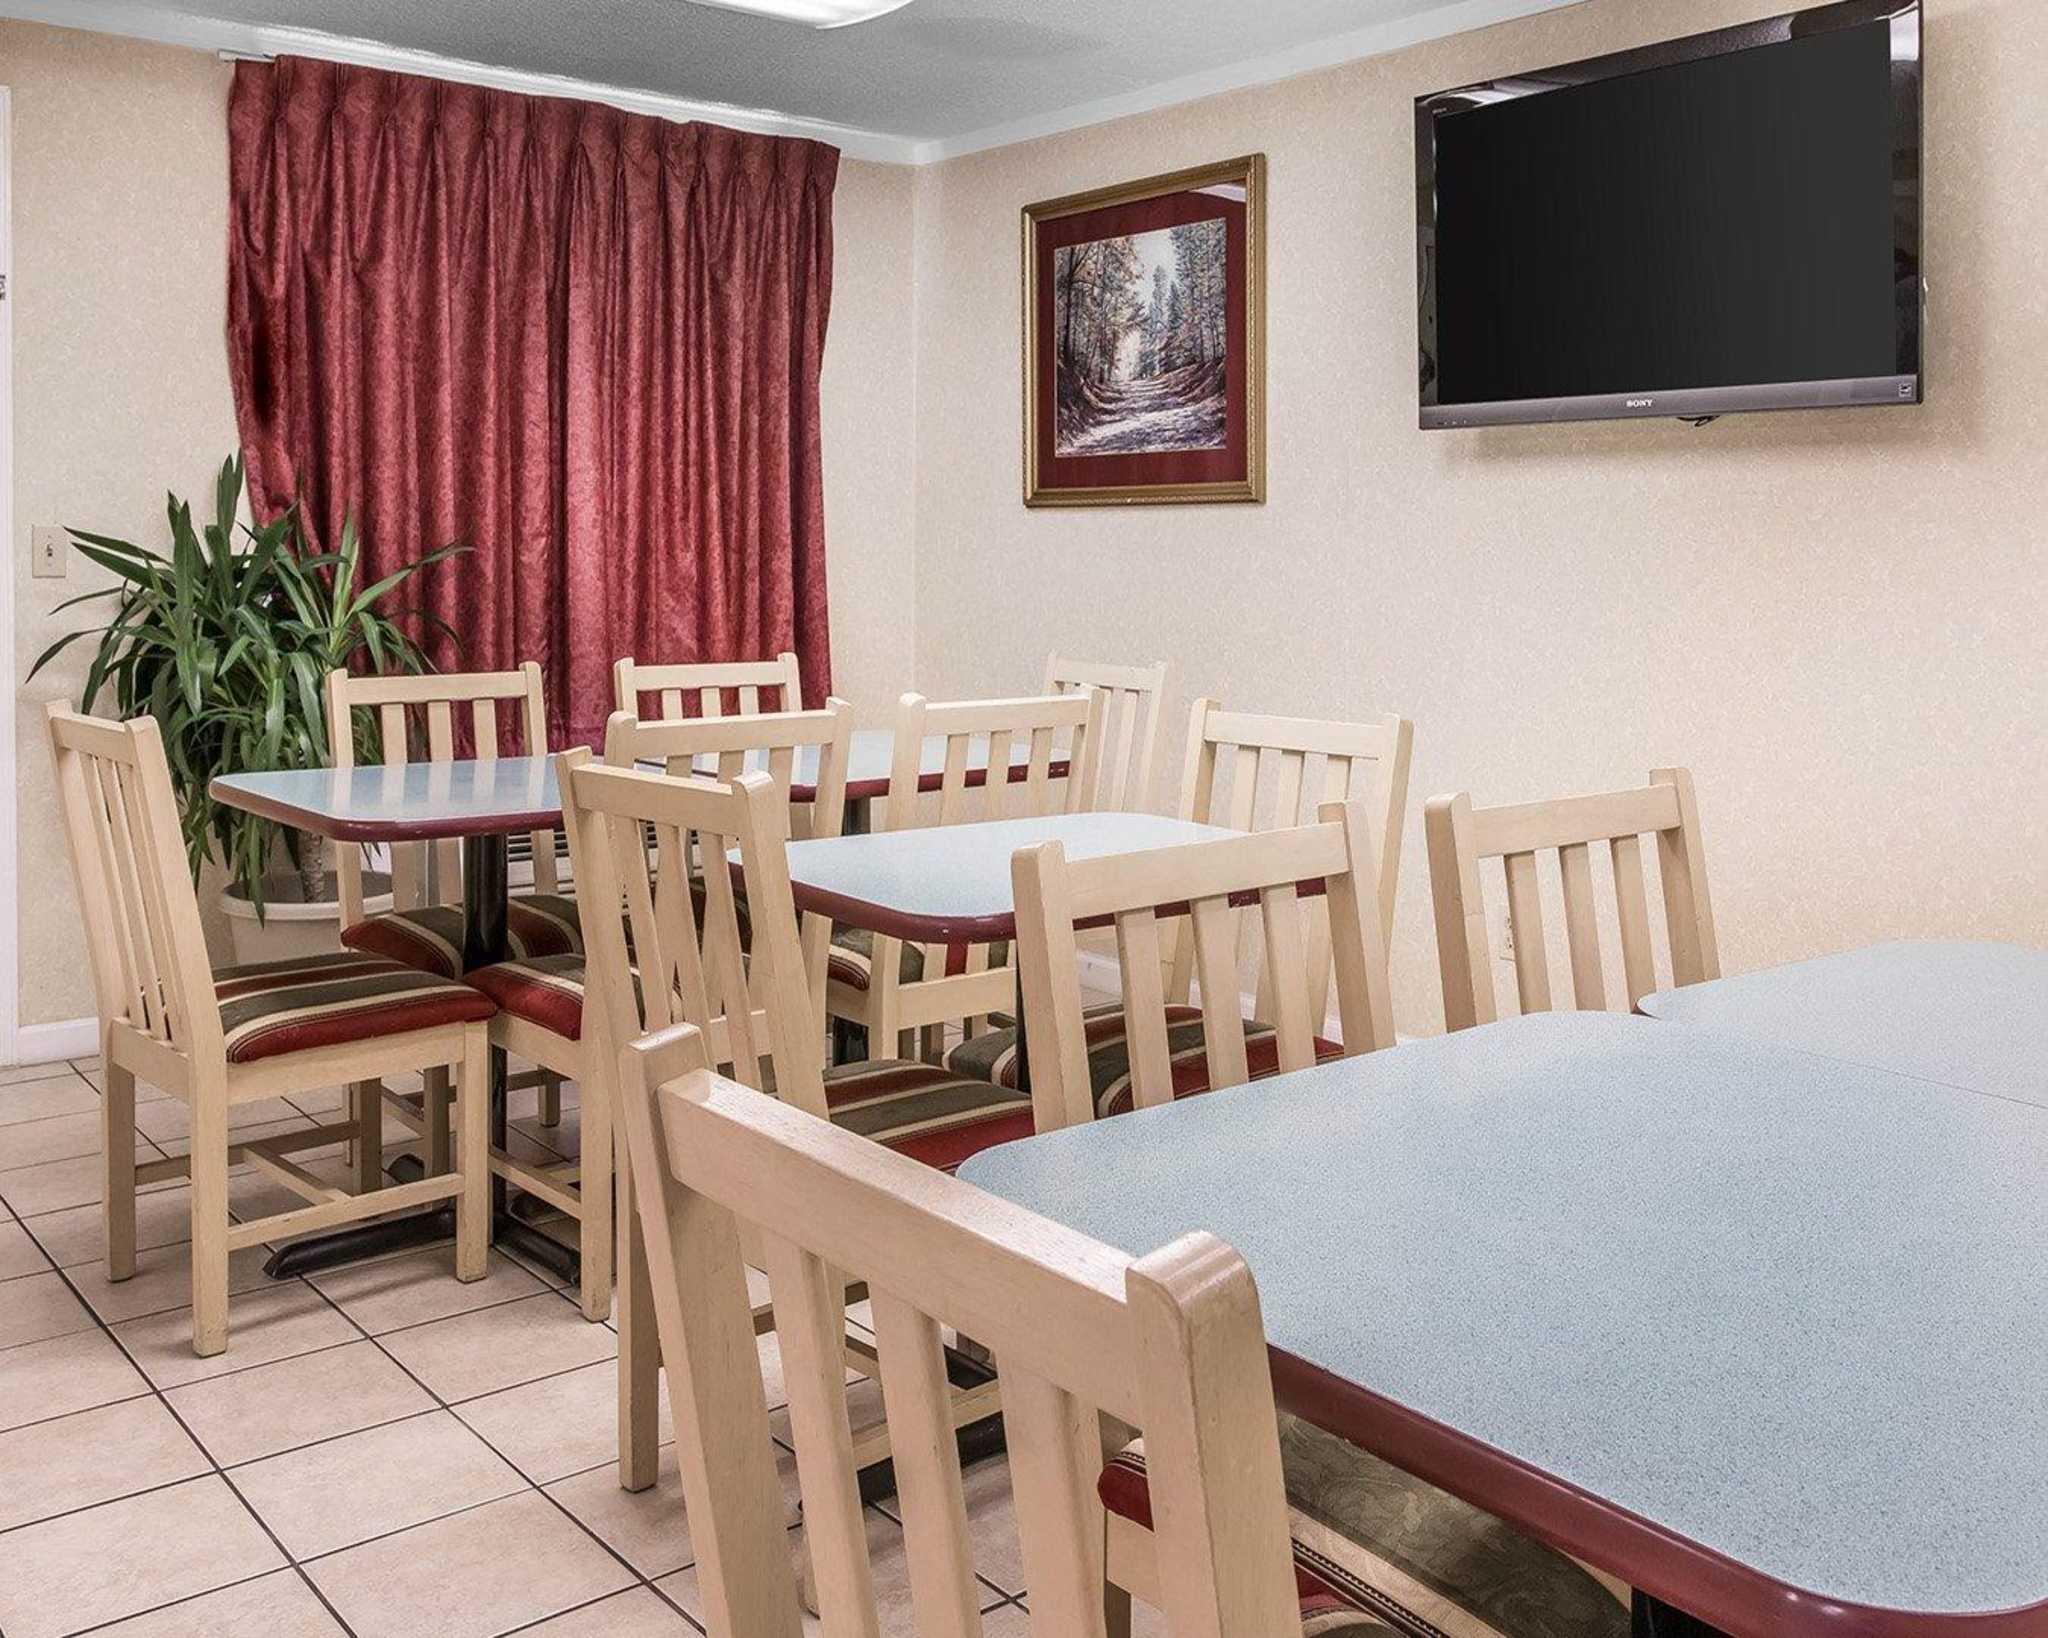 Rodeway Inn image 17